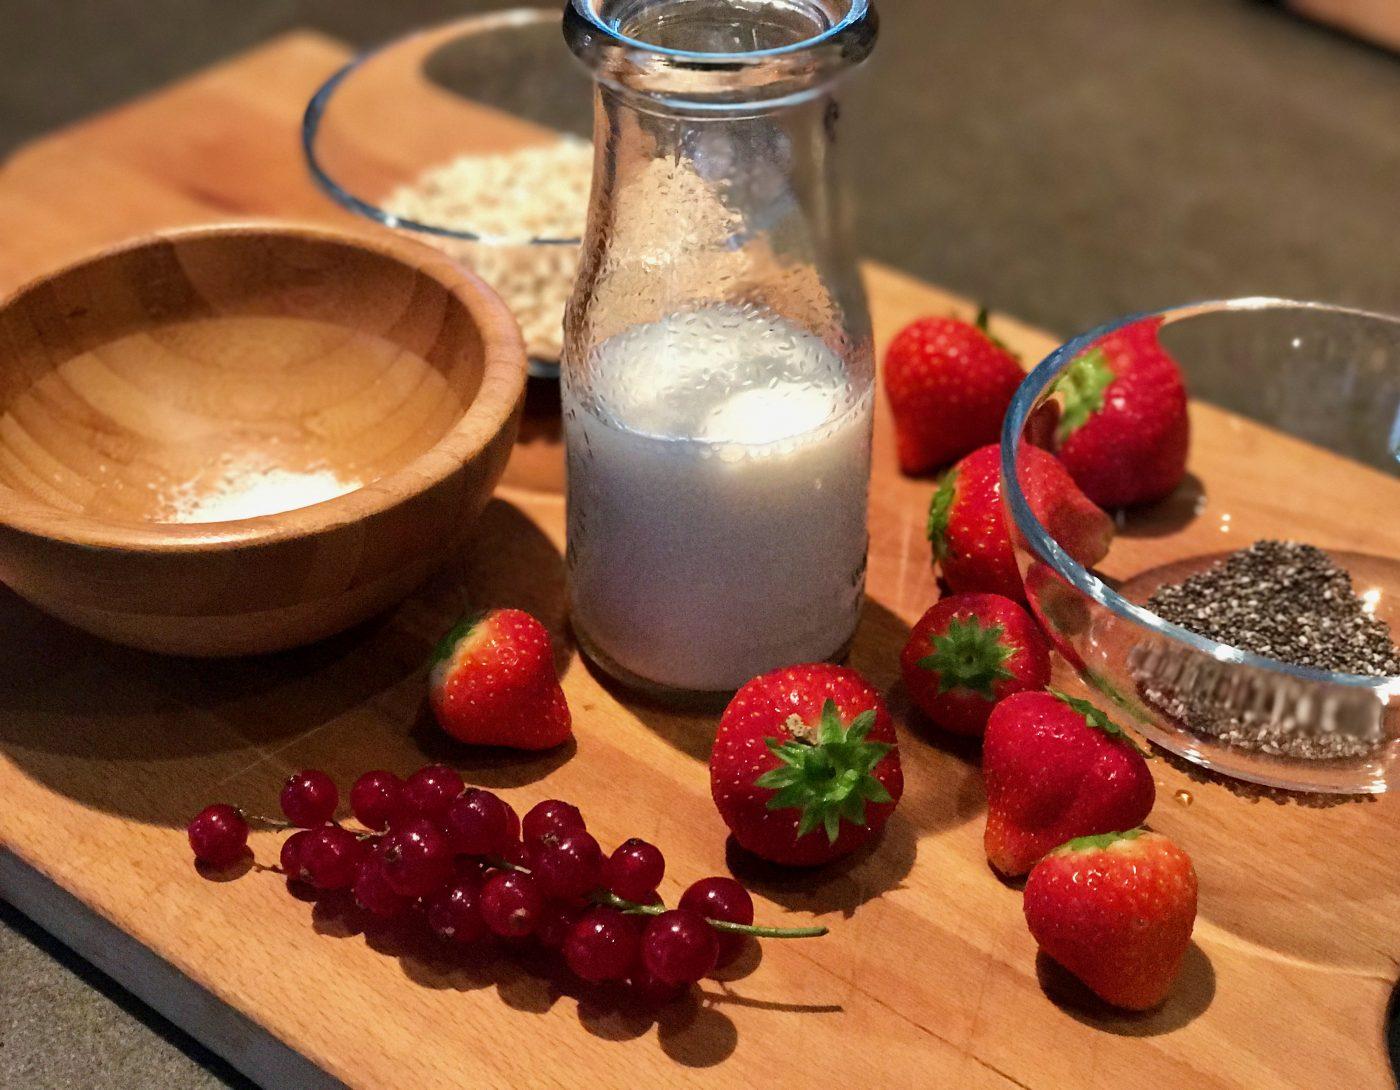 Zutaten Overnight Oat mit Erdbeeren und Johannisbeeren